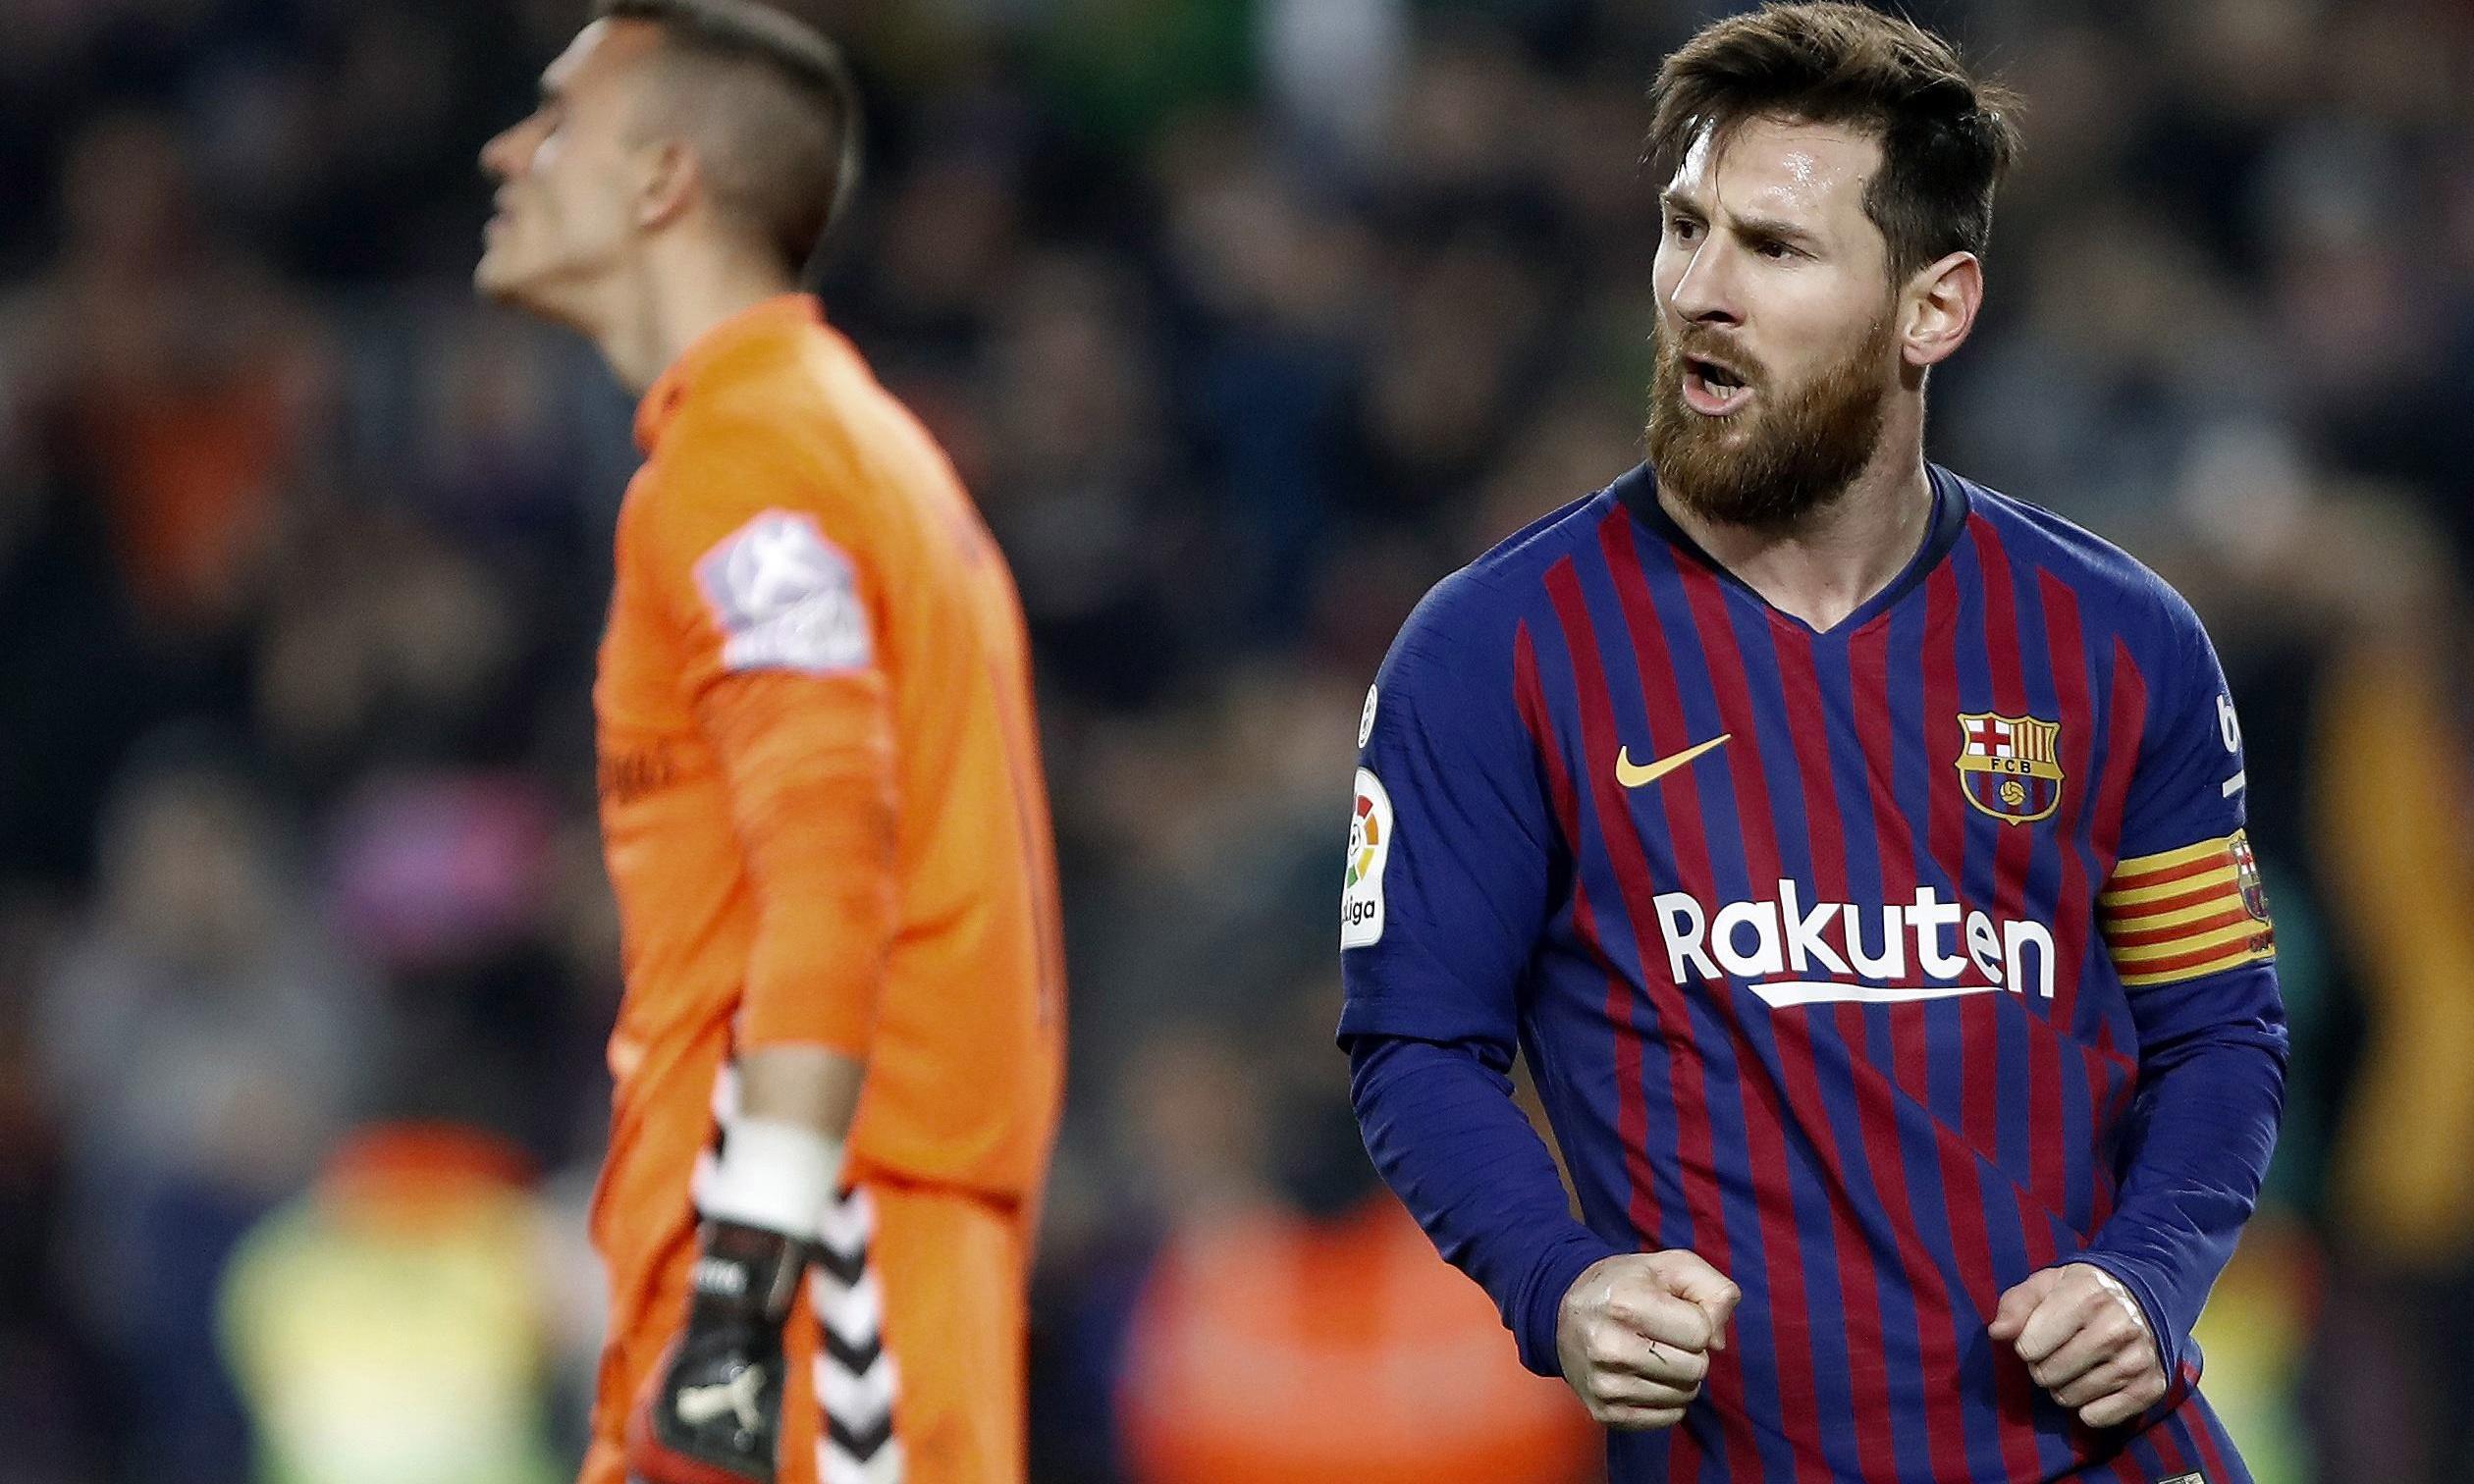 European roundup: Barcelona edge to win; Pizarro is oldest Bundesliga scorer